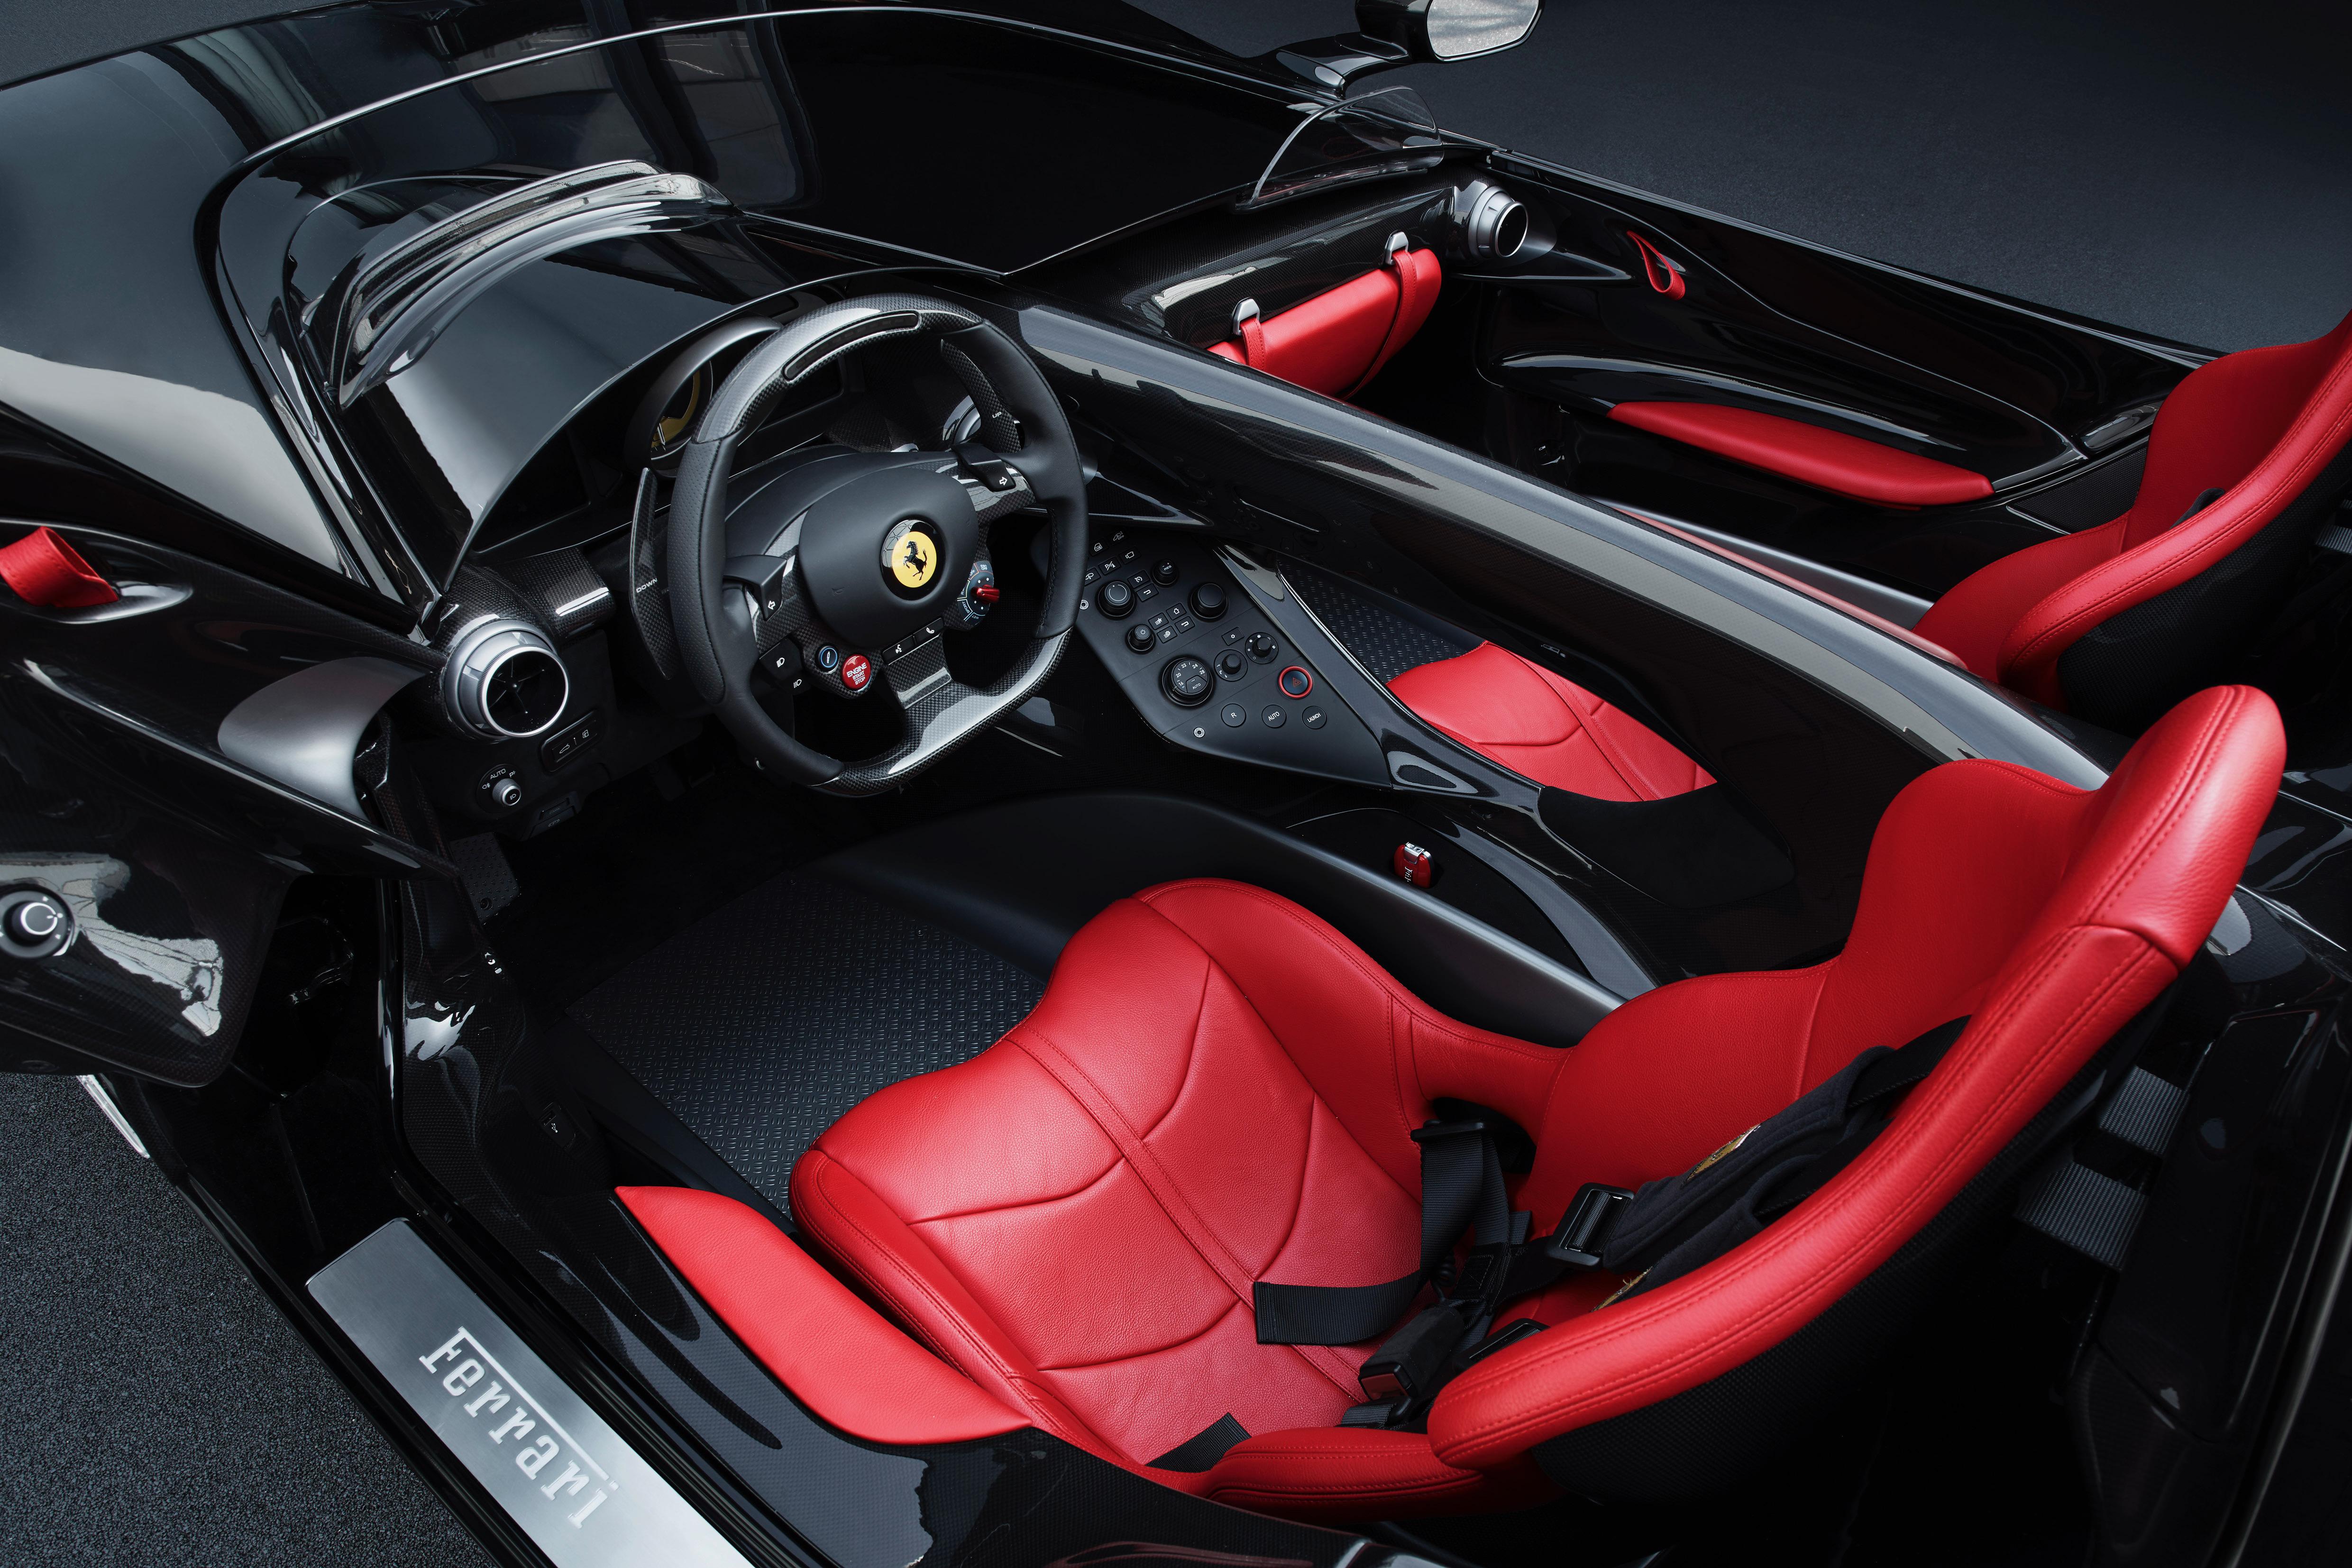 Ferrari, Forget future classics, these new Ferraris already are iconic, ClassicCars.com Journal